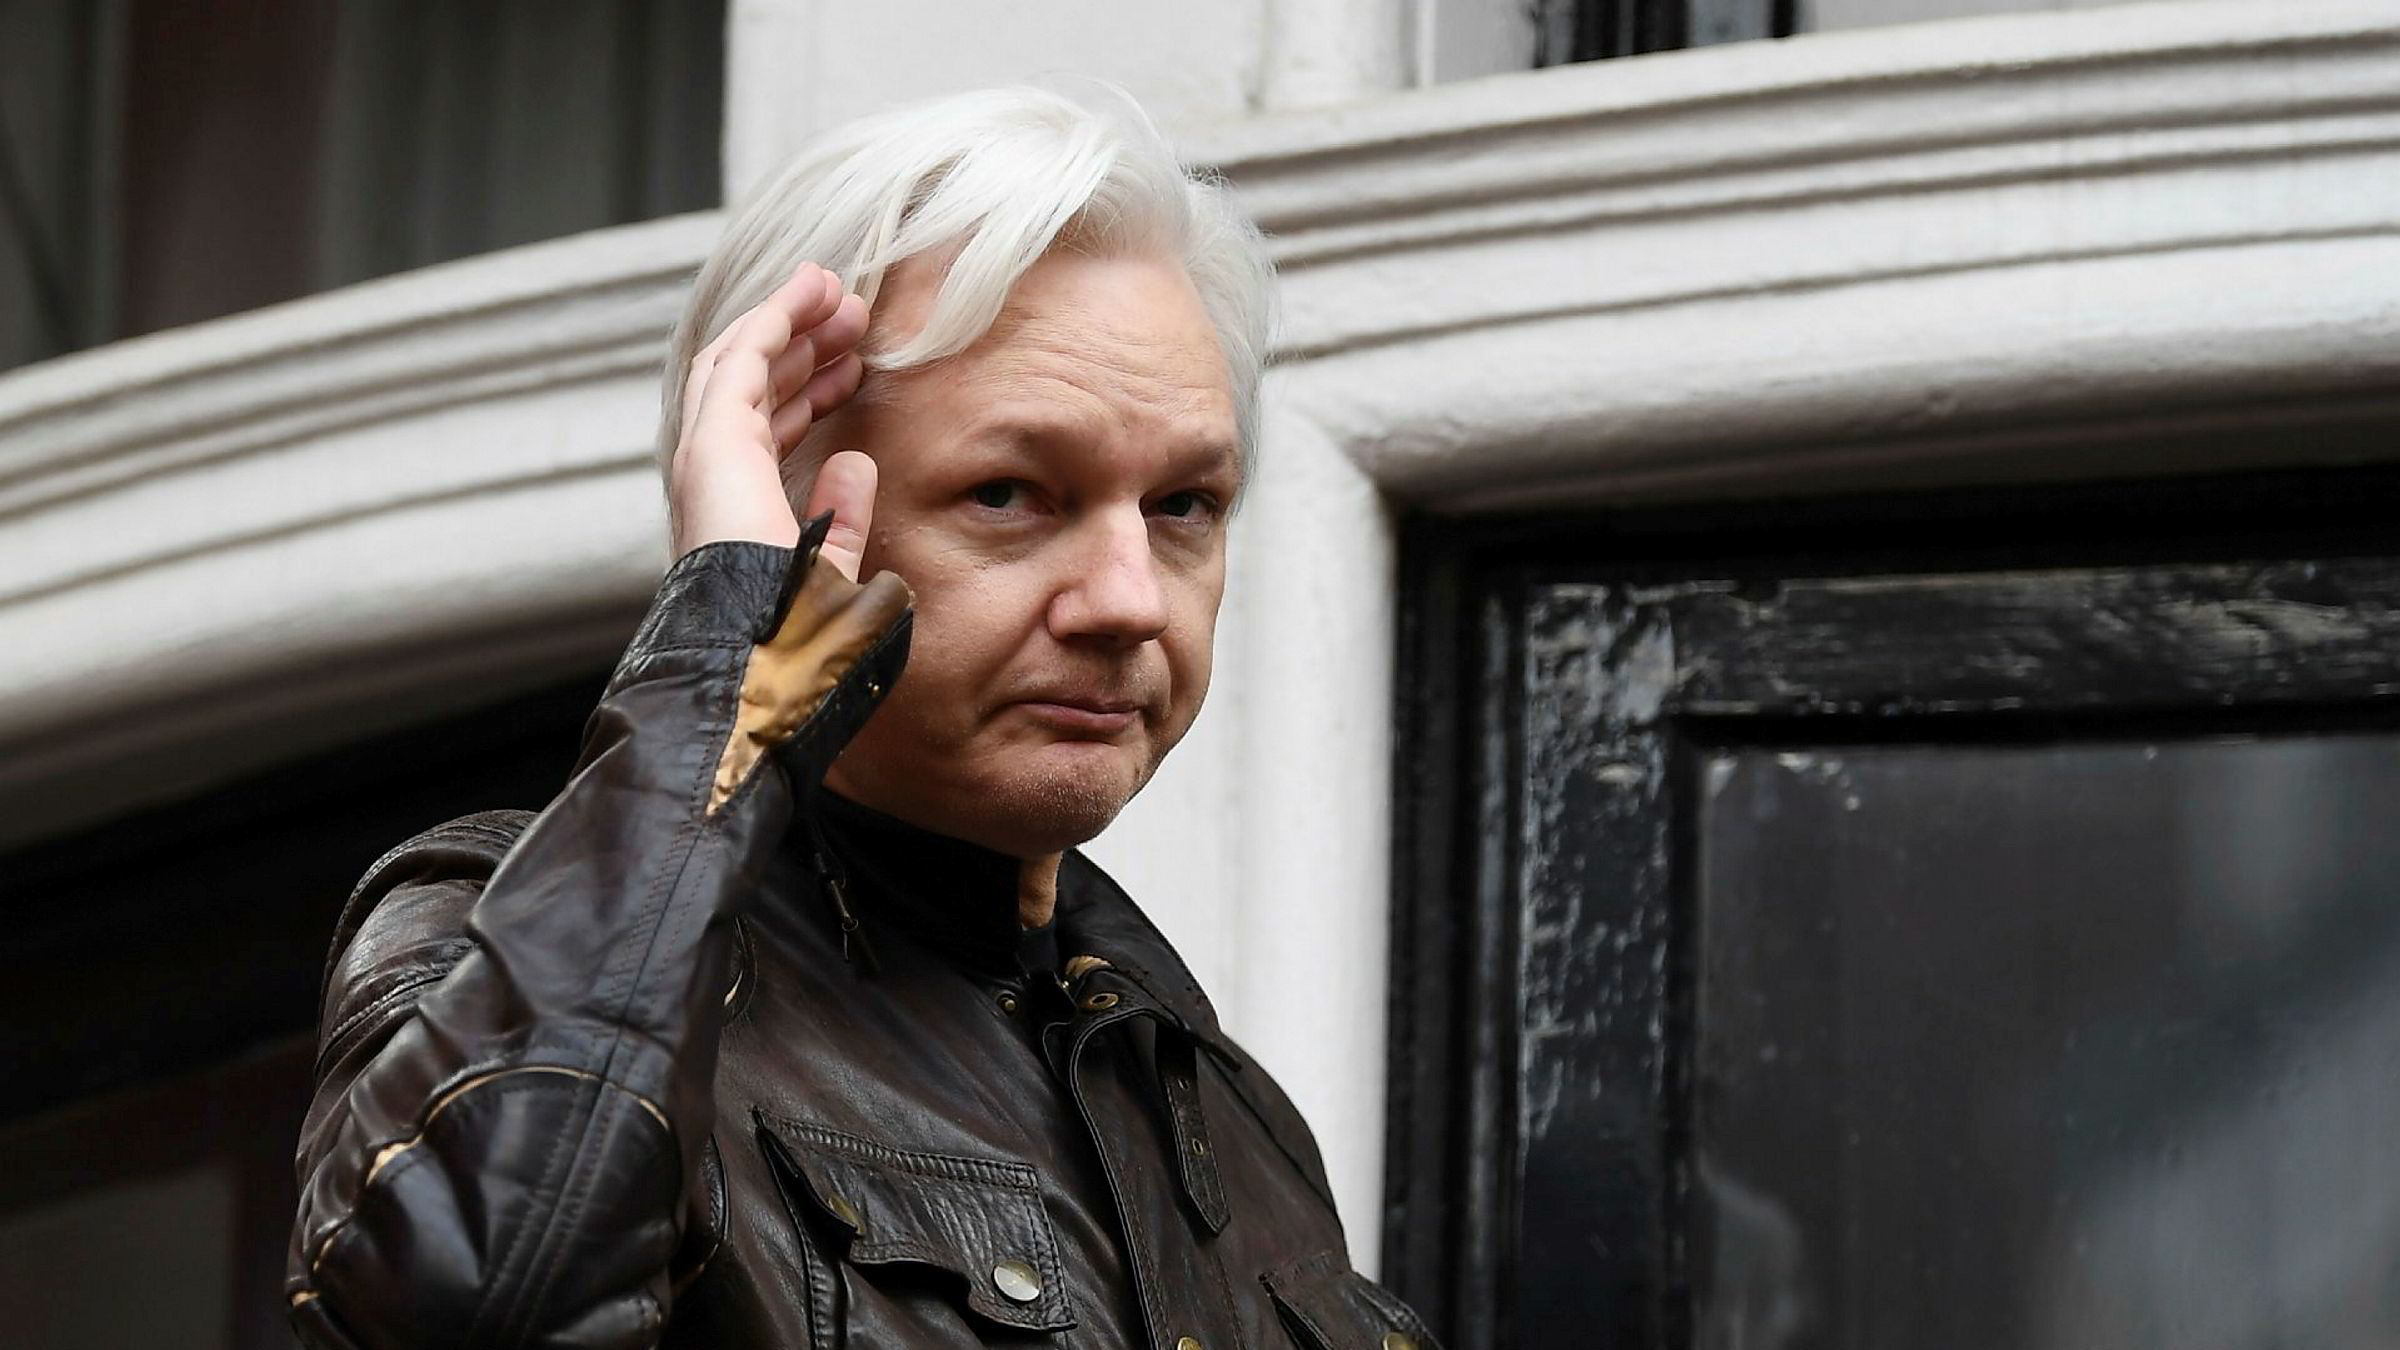 Australske Julian Assange tid på den ecuadorianske ambassaden i London kan gå mot slutten.